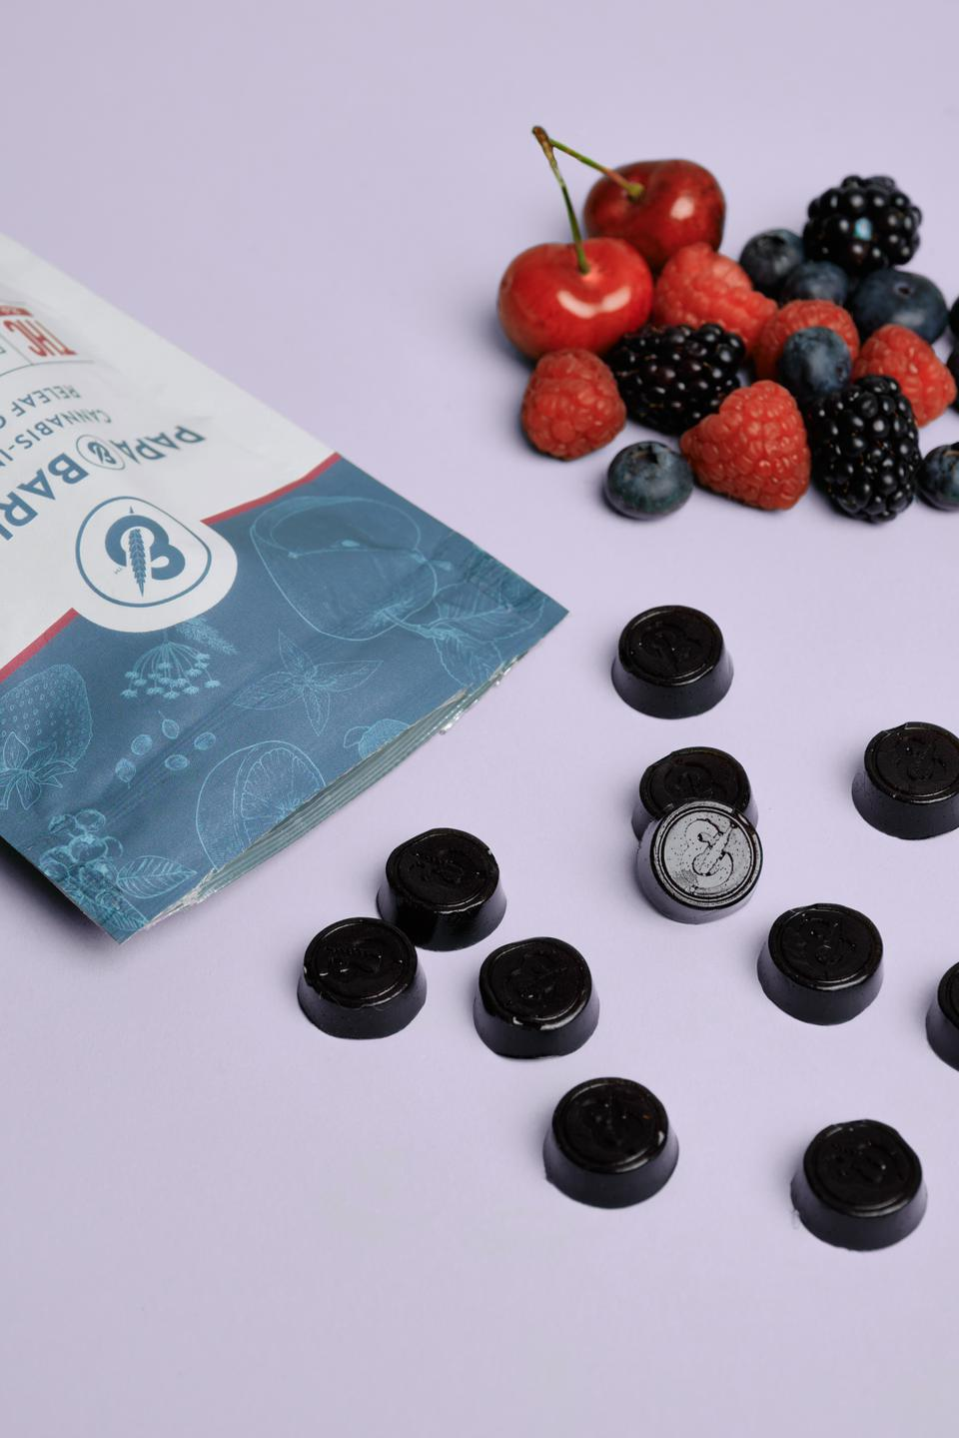 brand new releaf gummies